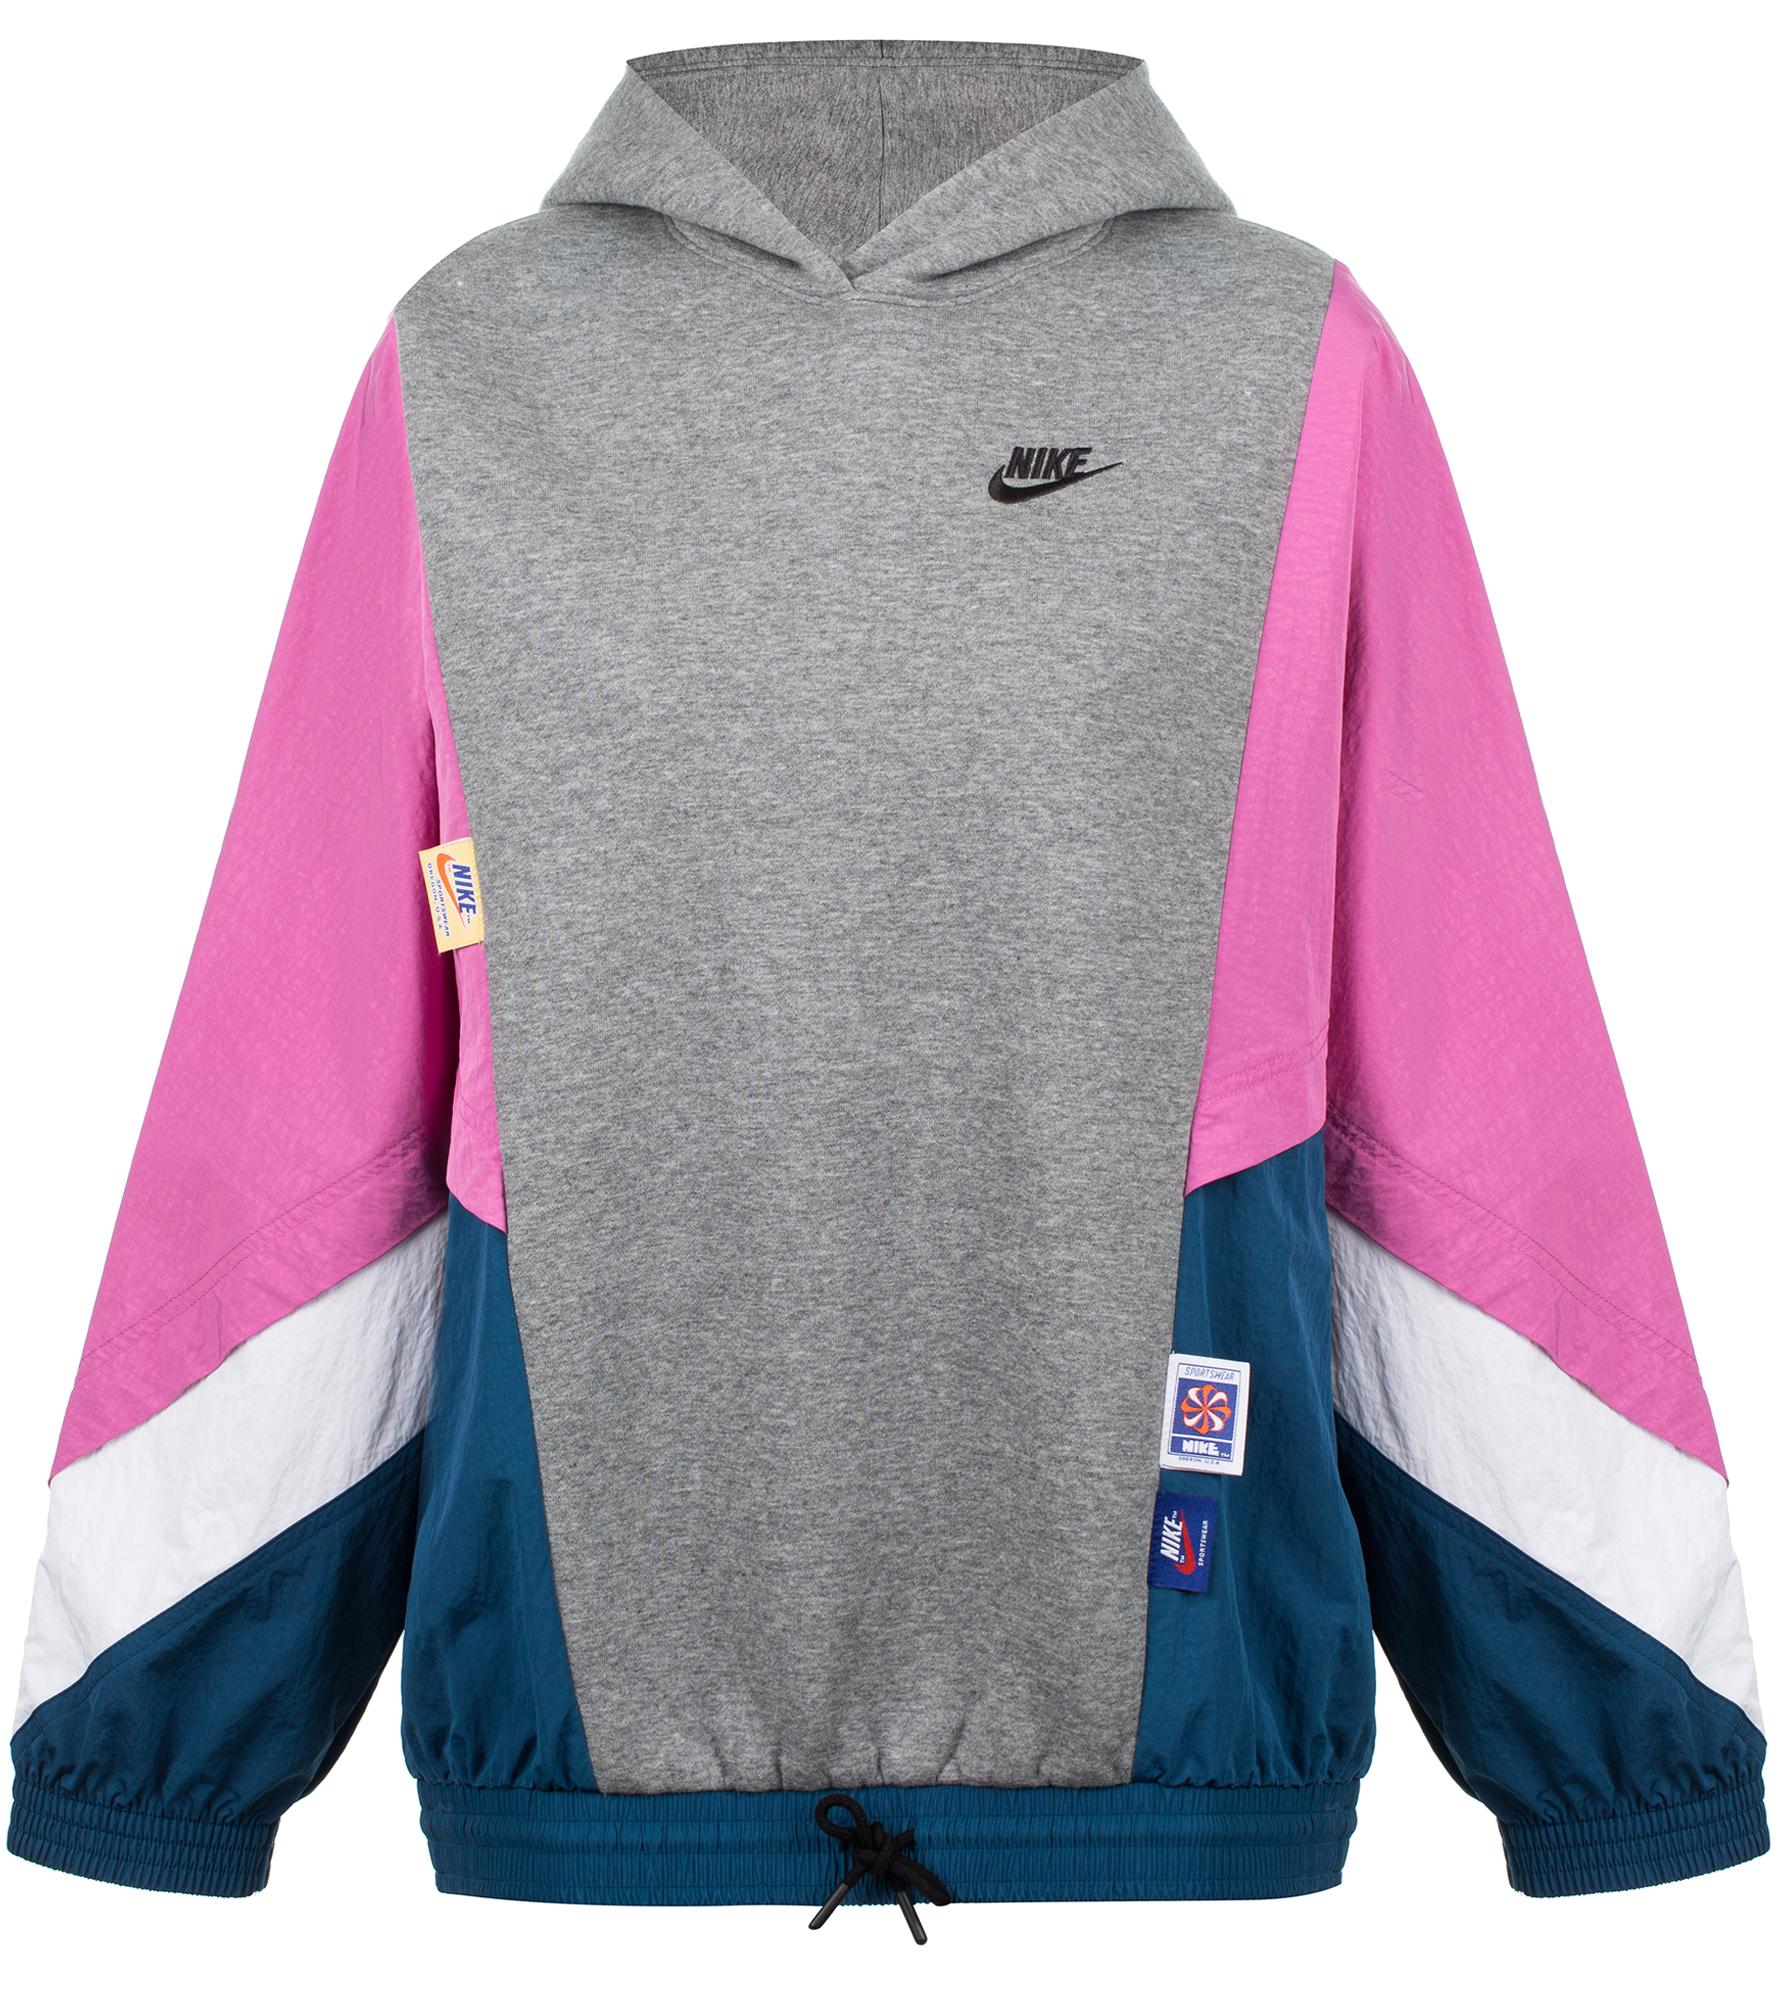 цена Nike Худи женская Nike Sportswear, размер 46-48 онлайн в 2017 году